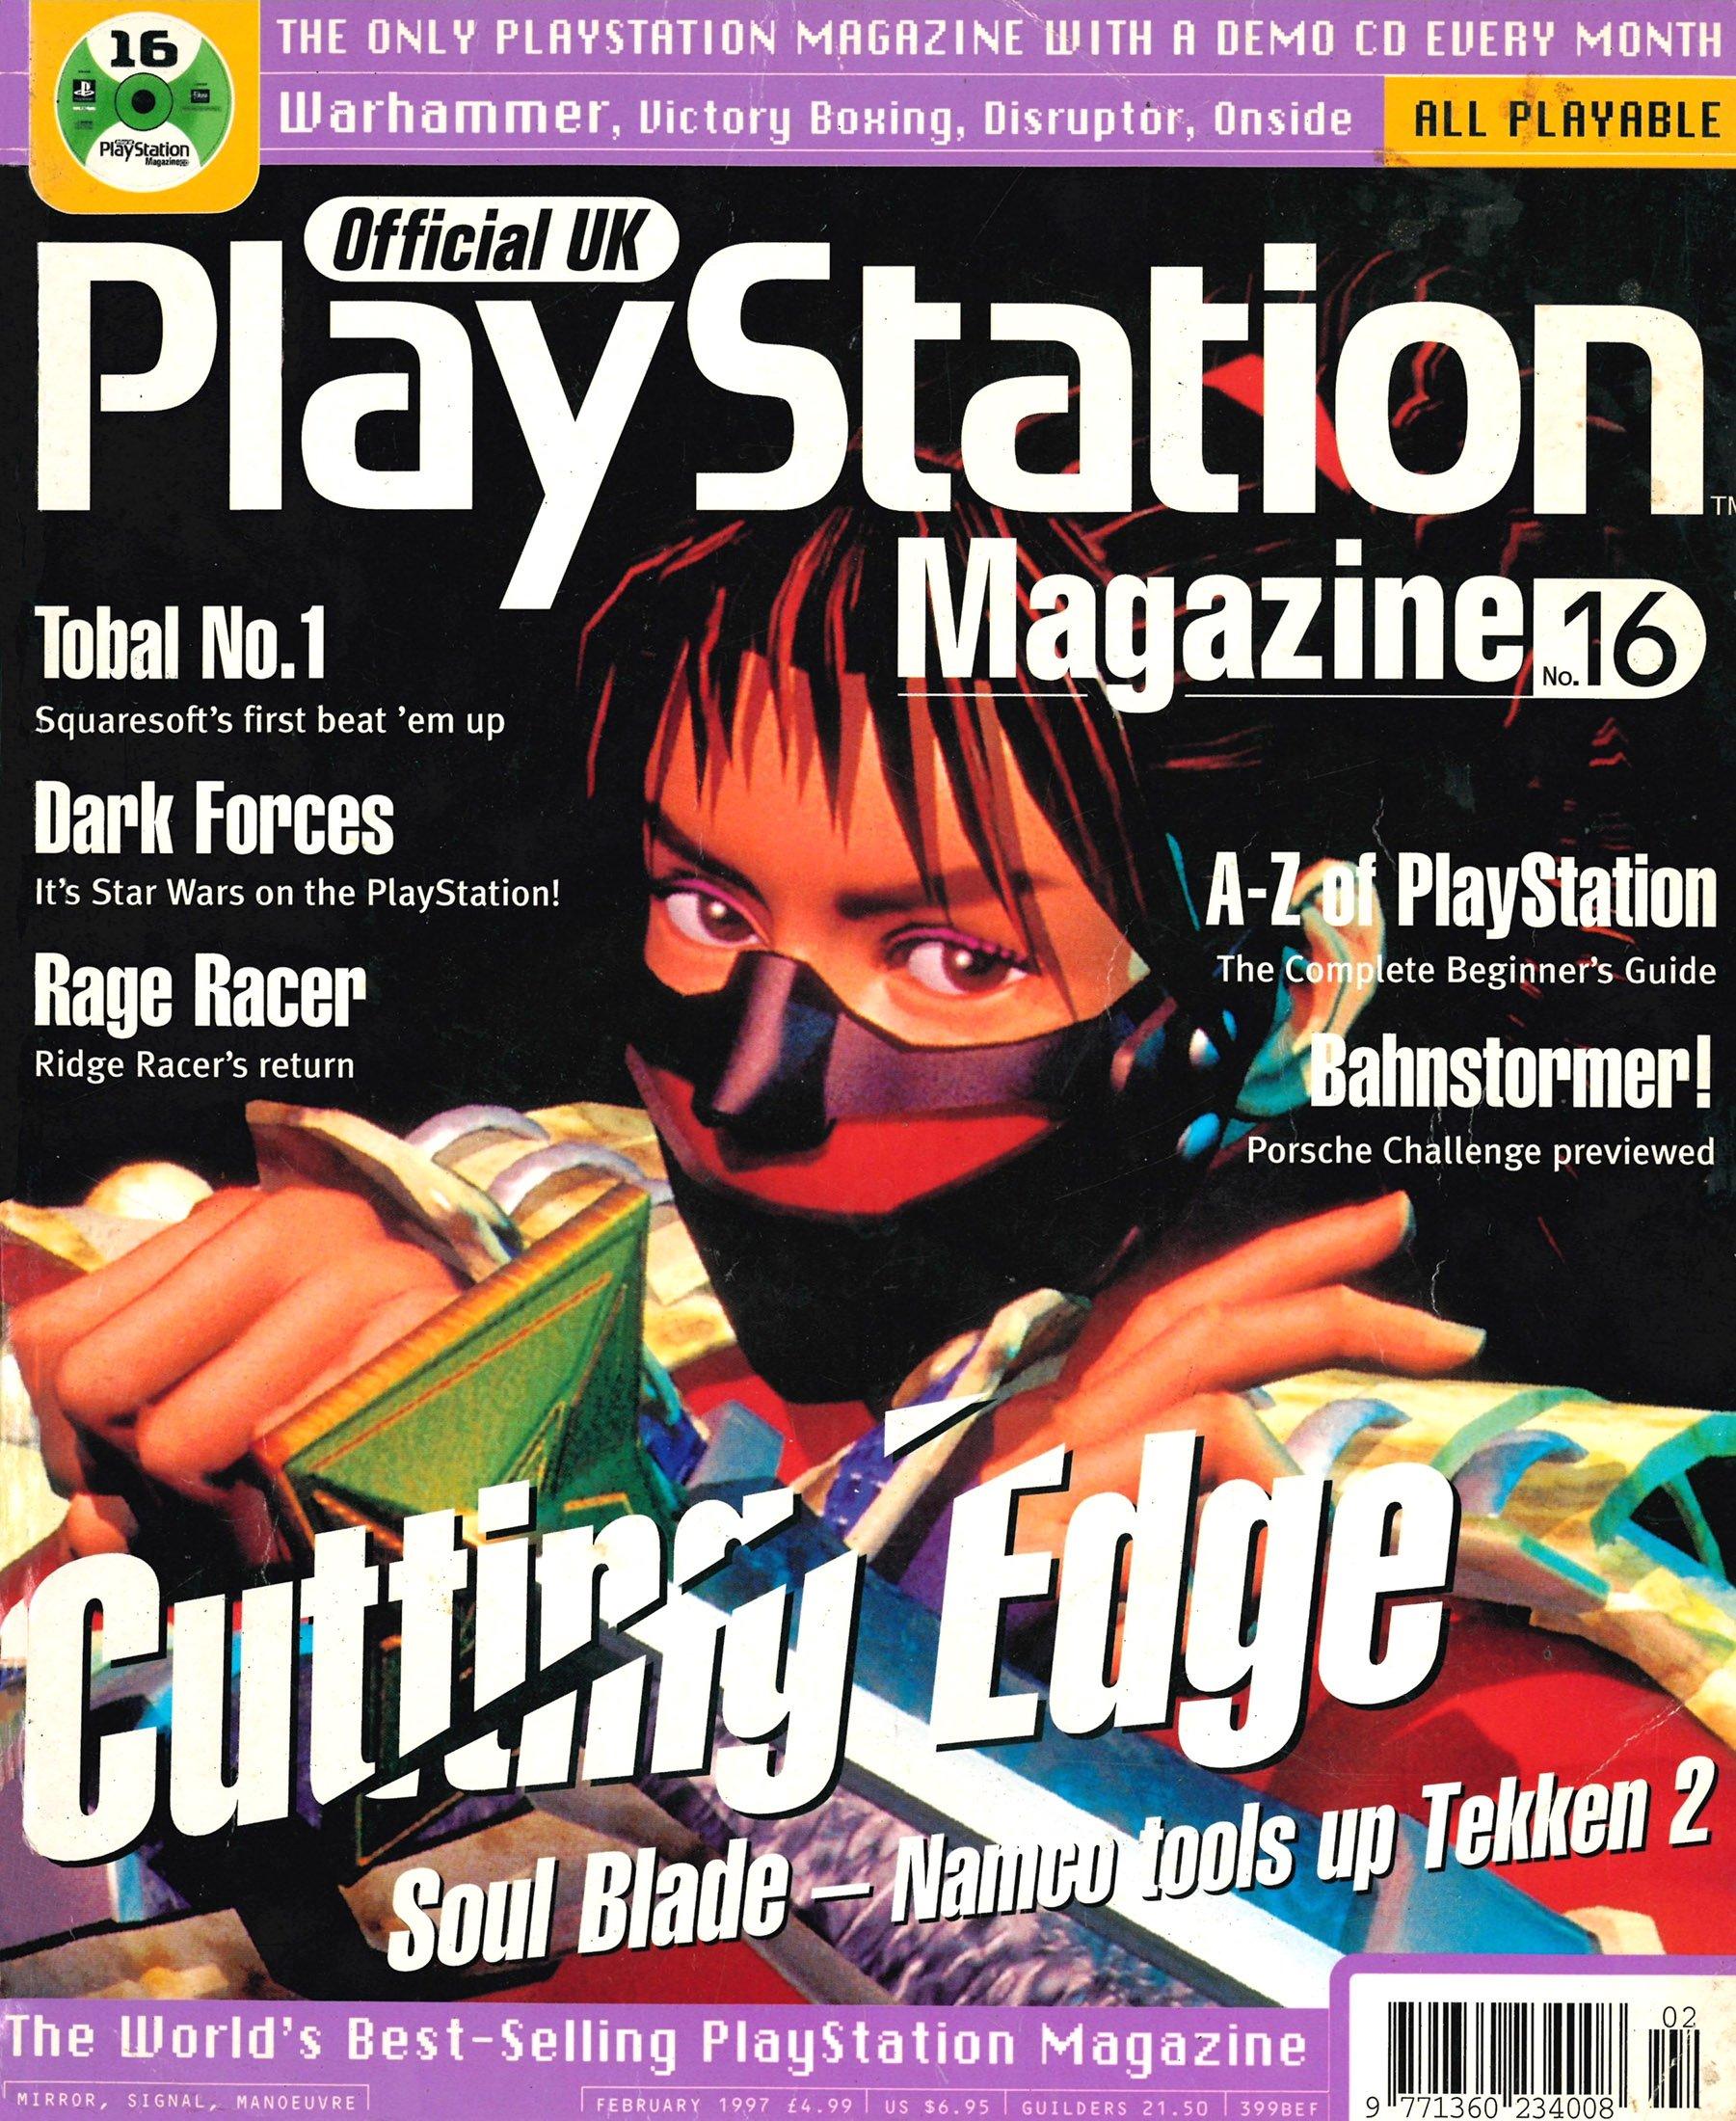 Official UK PlayStation Magazine Issue 016 (February 1997)